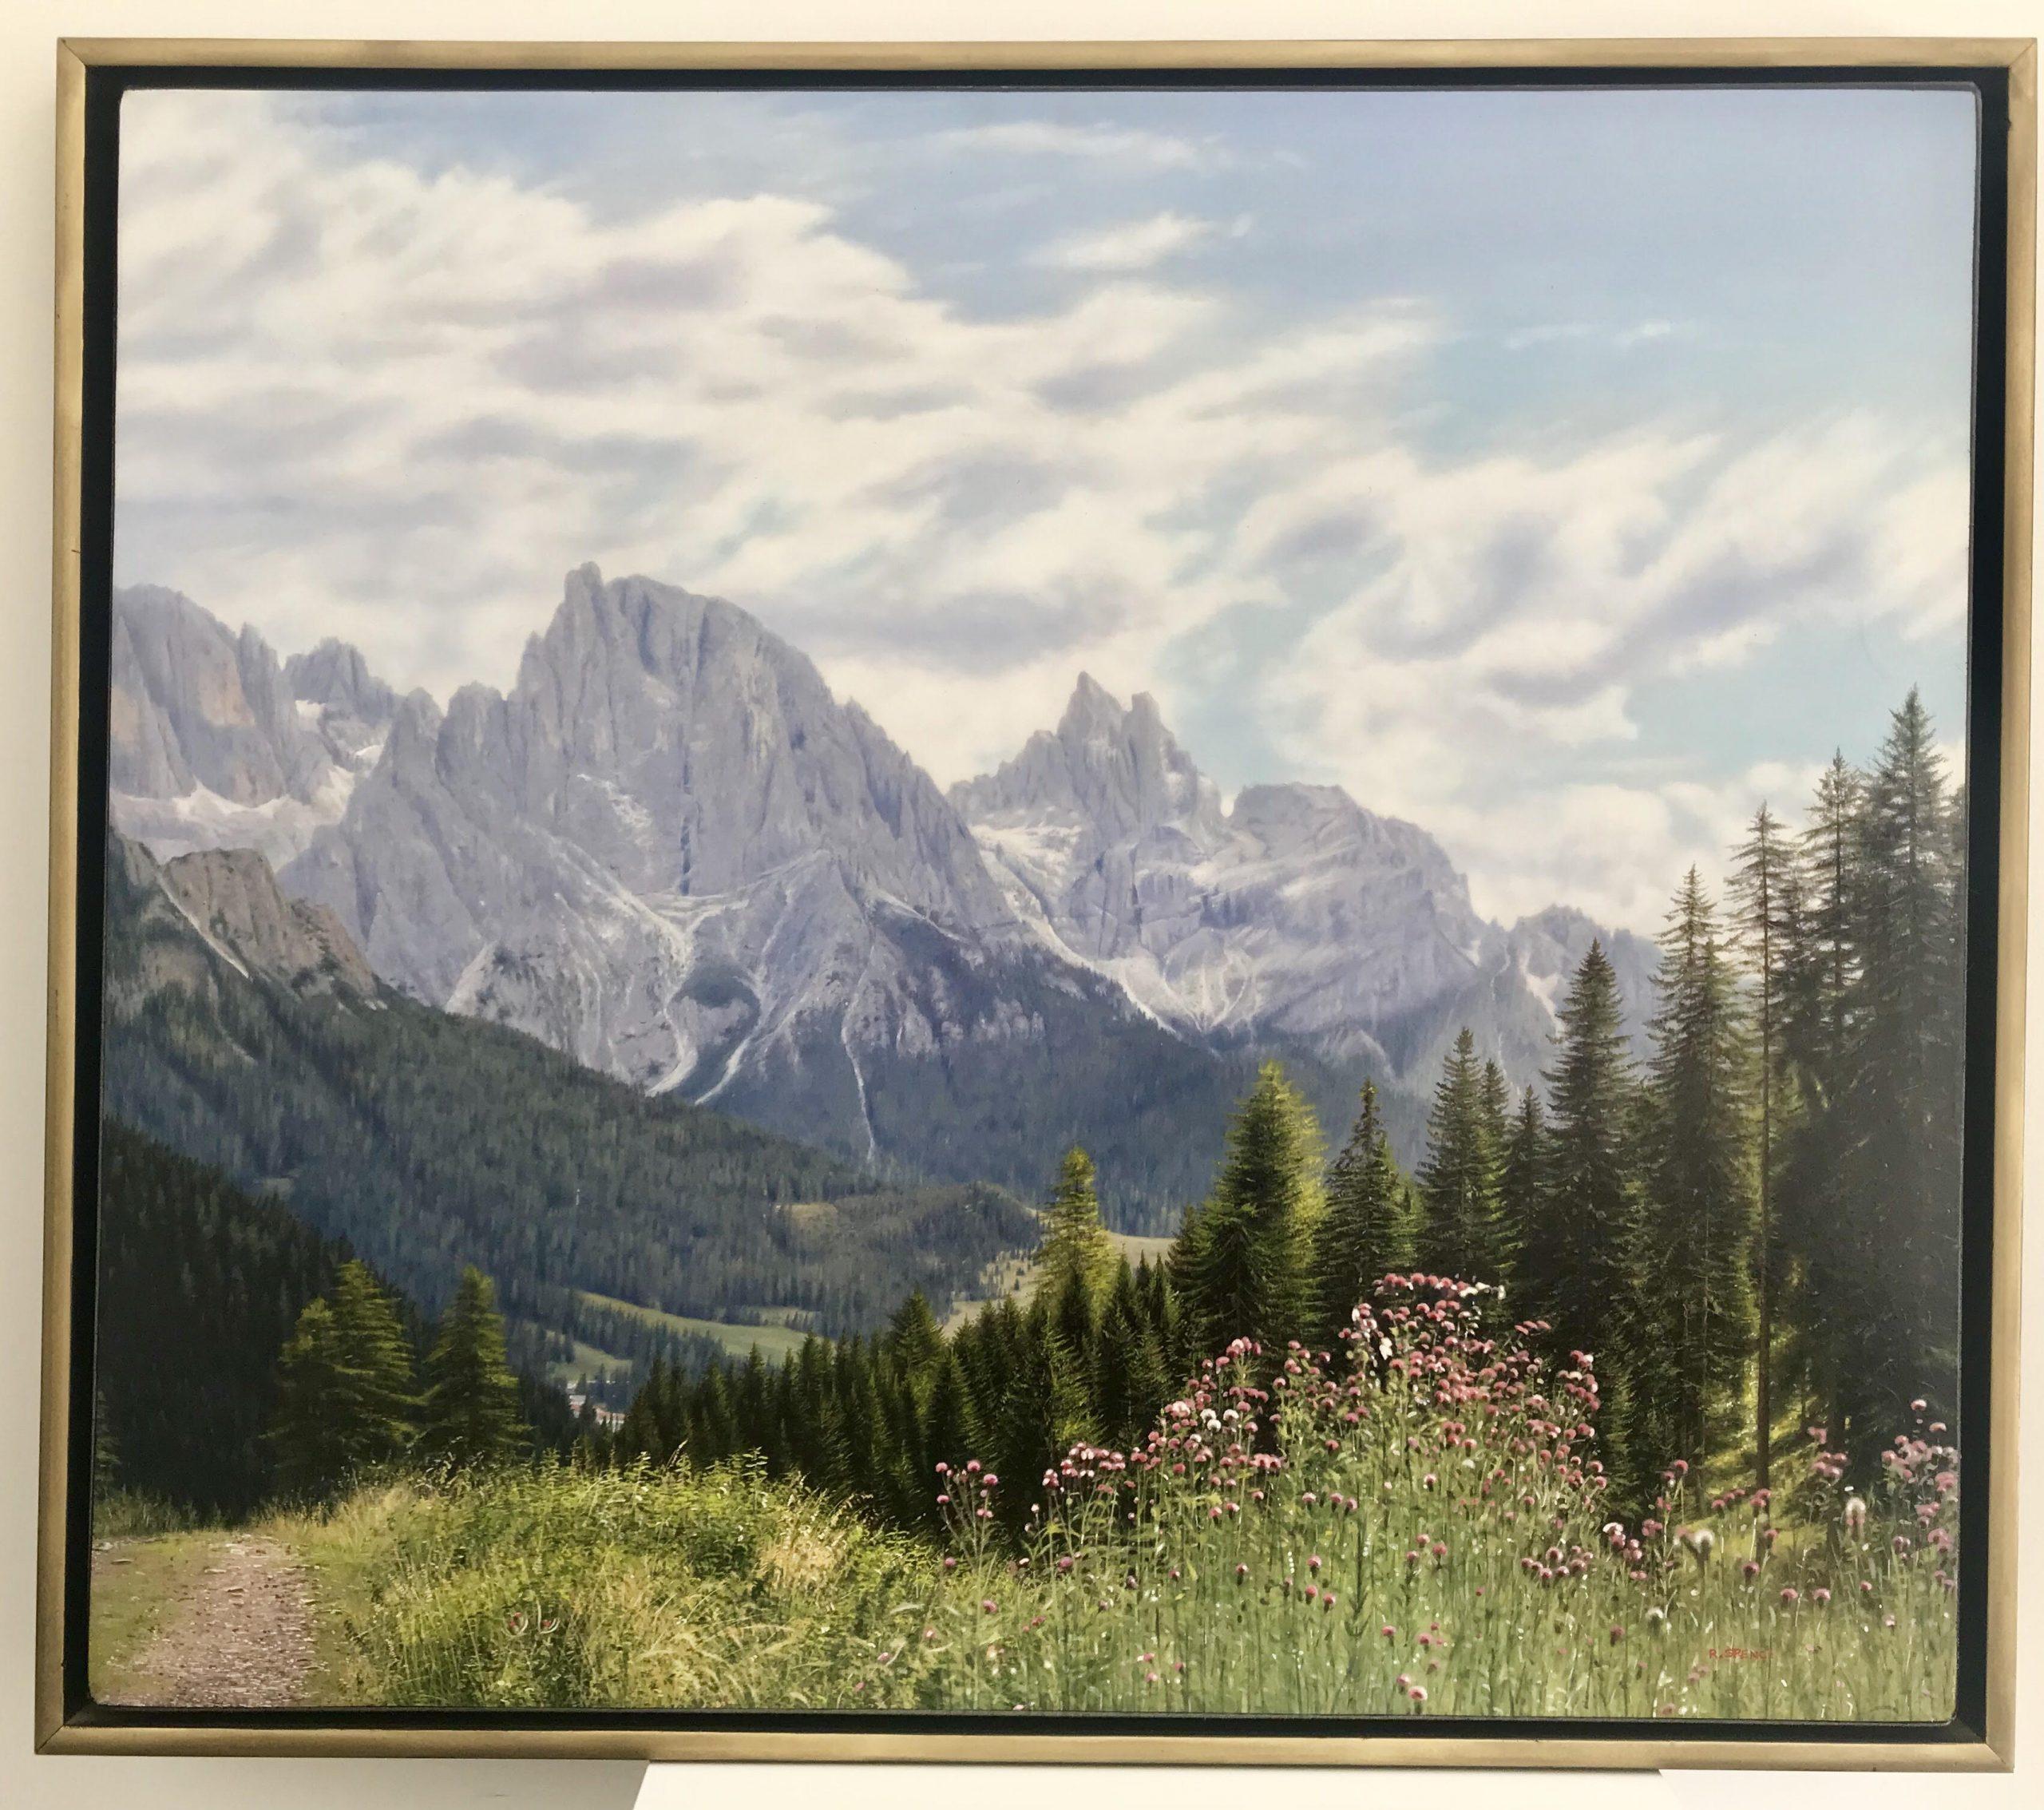 The Pioneers (Dolomiti) – Raphaella Spence